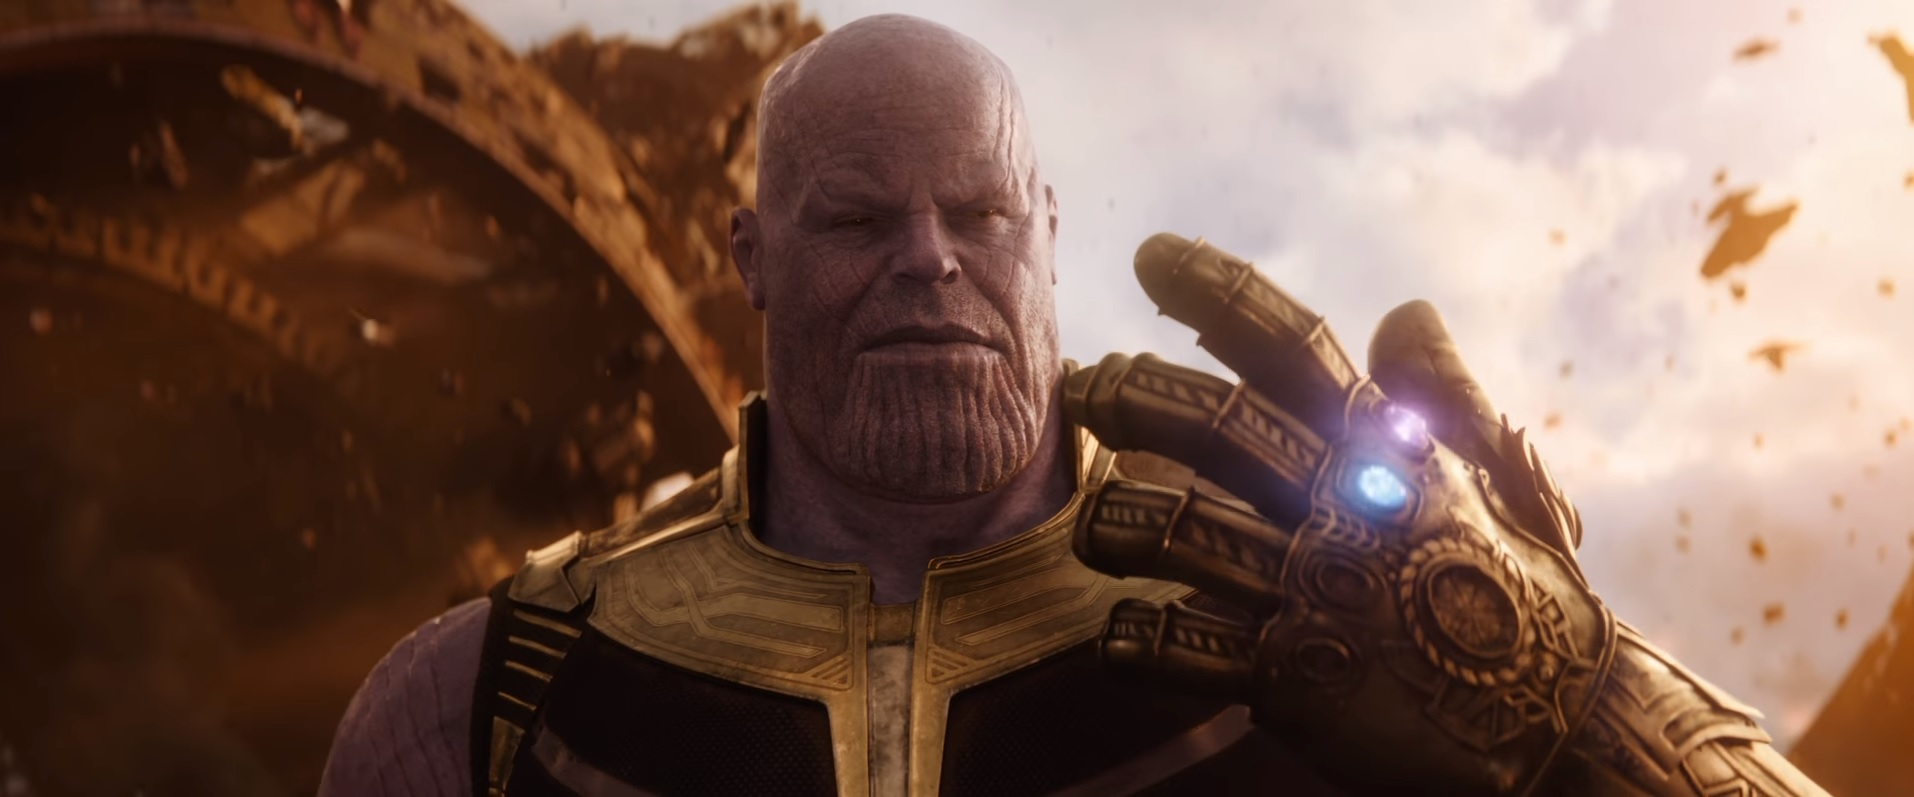 Mirá el primer trailer de Avengers: Infinity War!